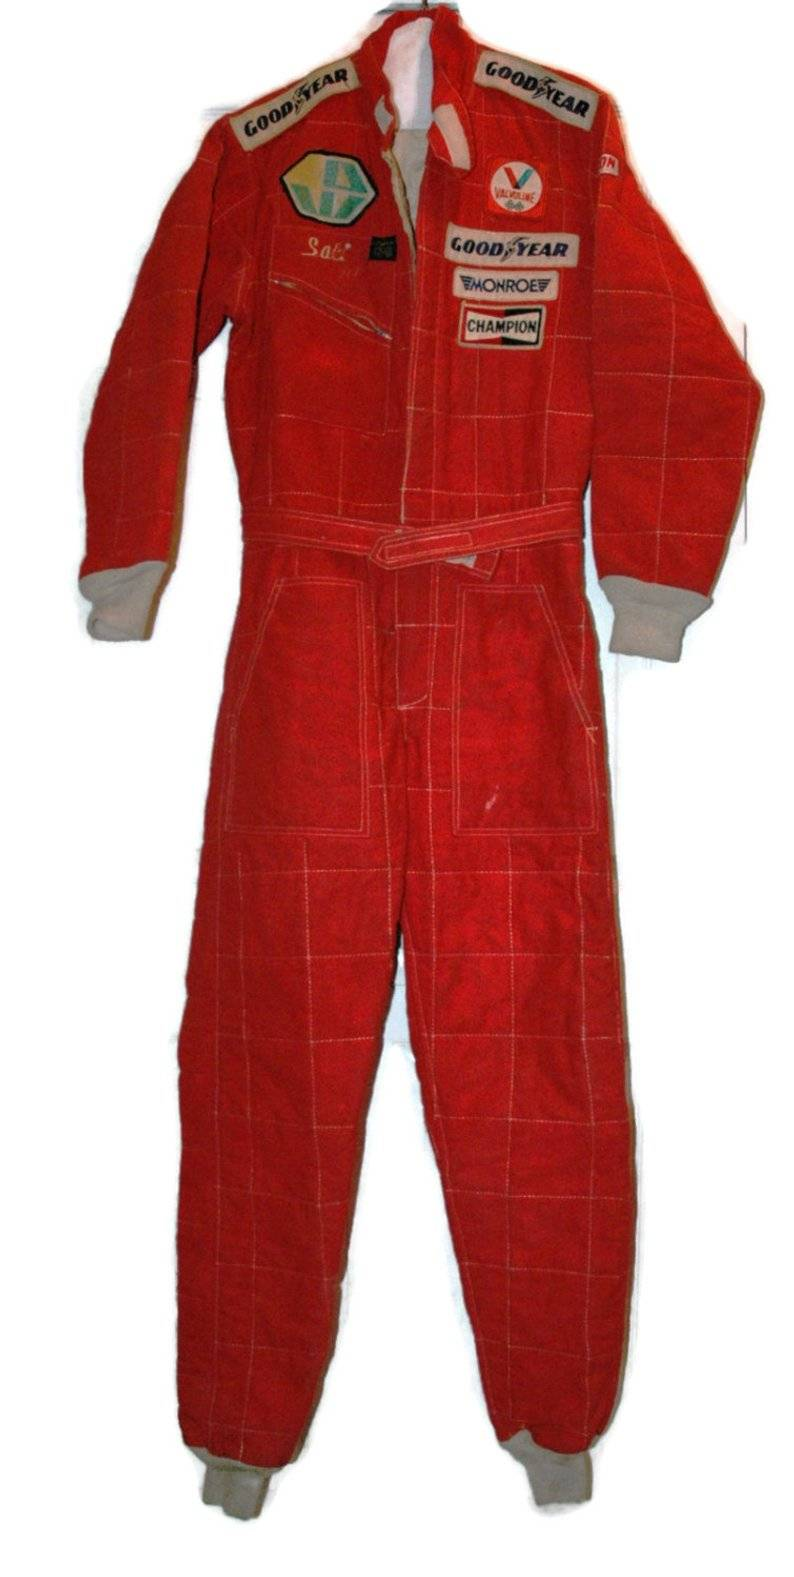 salt walther race suit